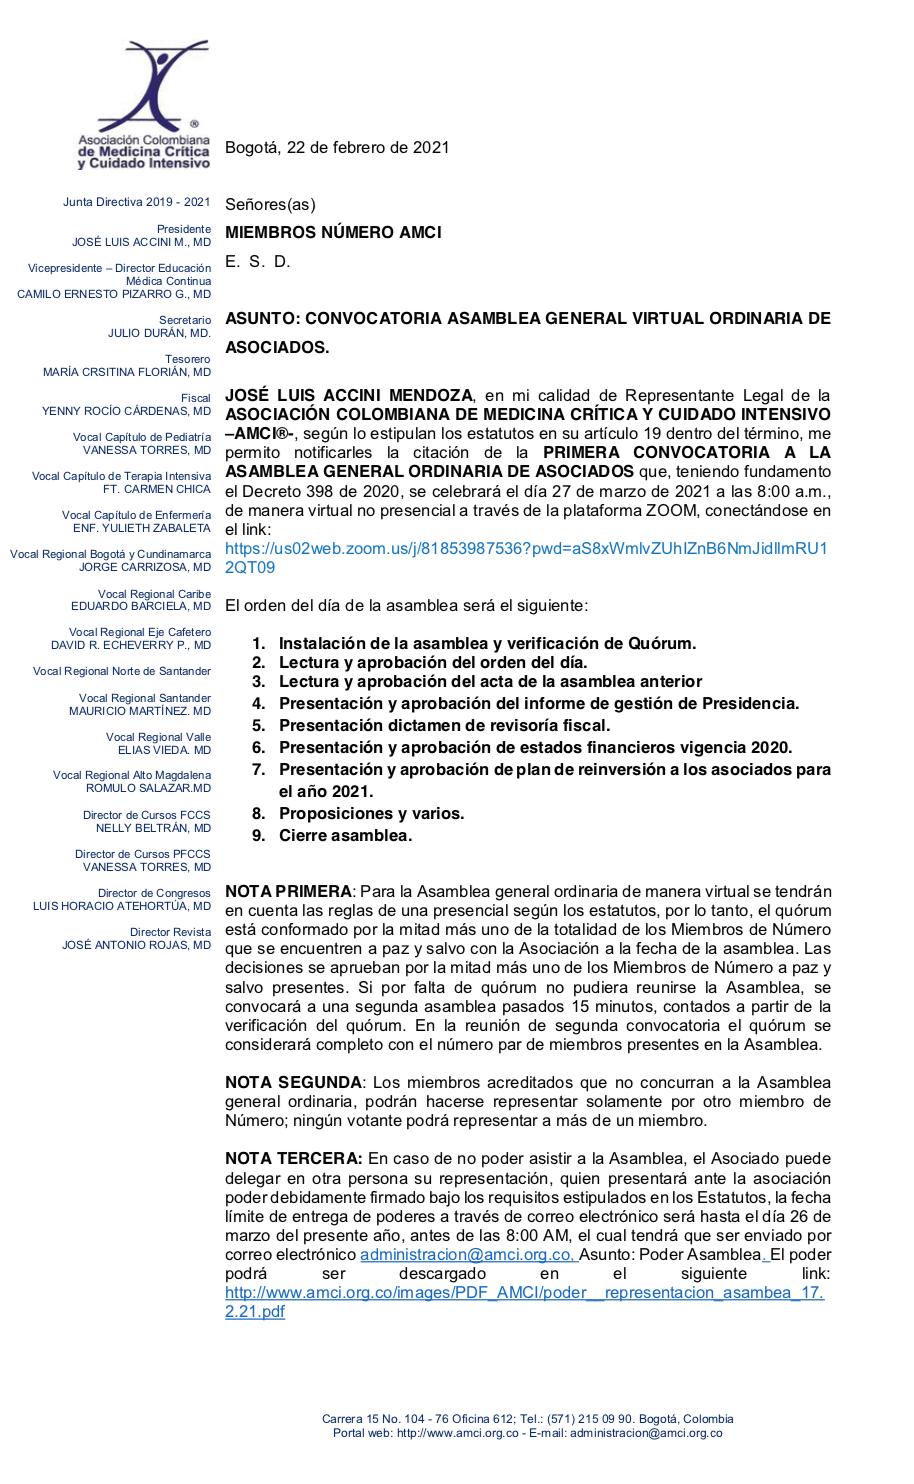 CONVOCATORIA ASAMBLEA GENERAL VIRTUAL ORDINARIA DE ASOCIADOS - 27 de marzo de 2021